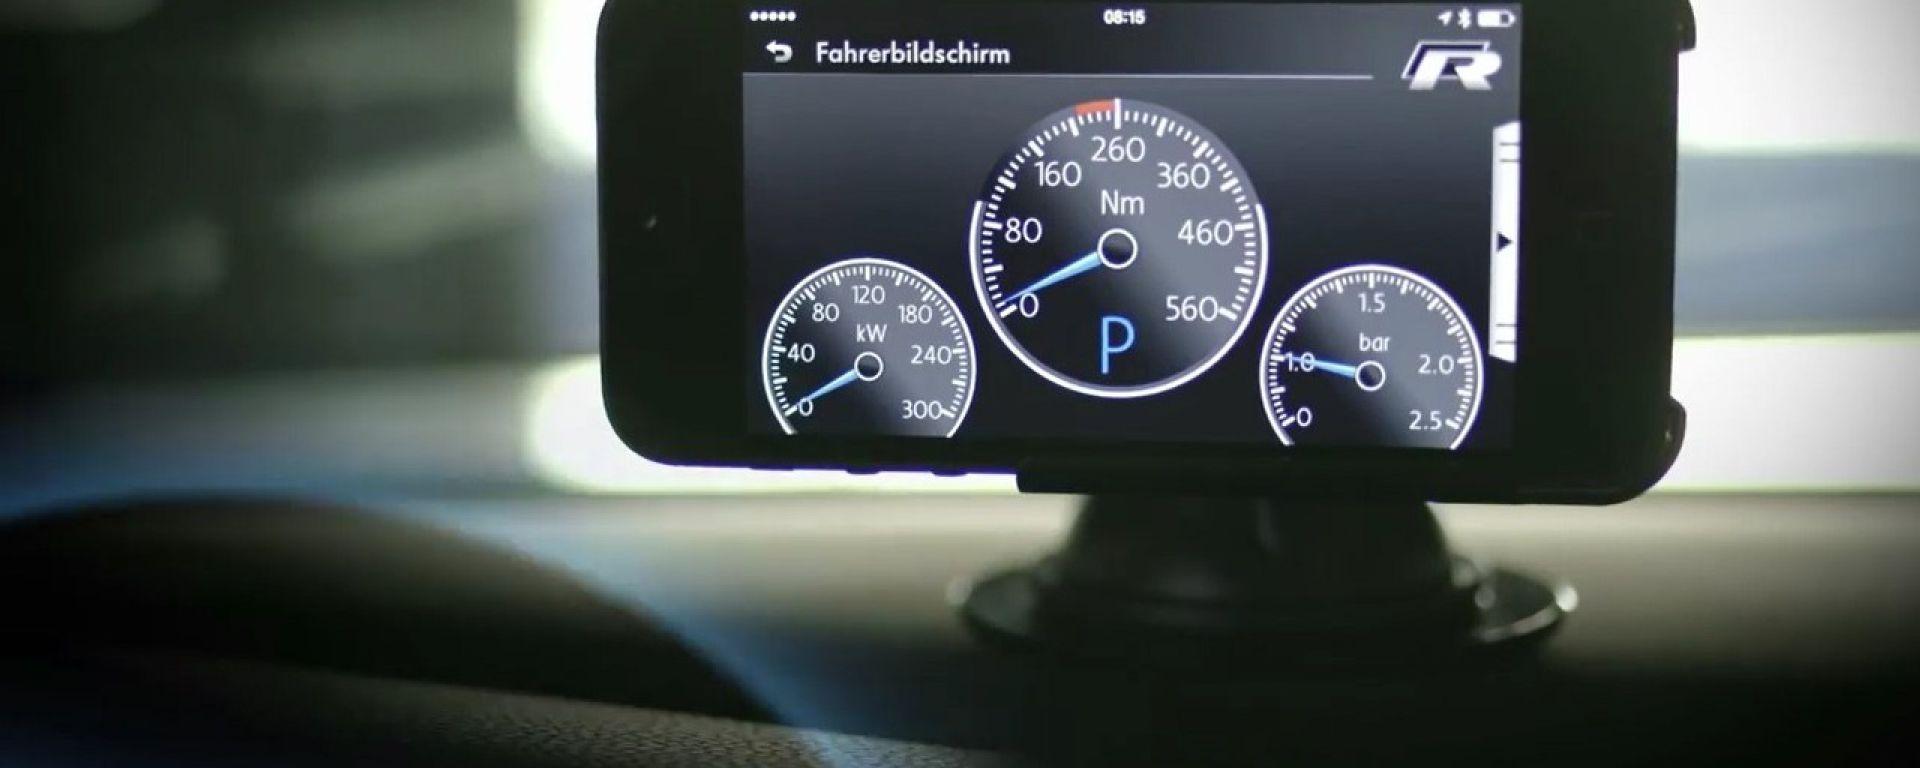 Volkswagen LogBox e Race app